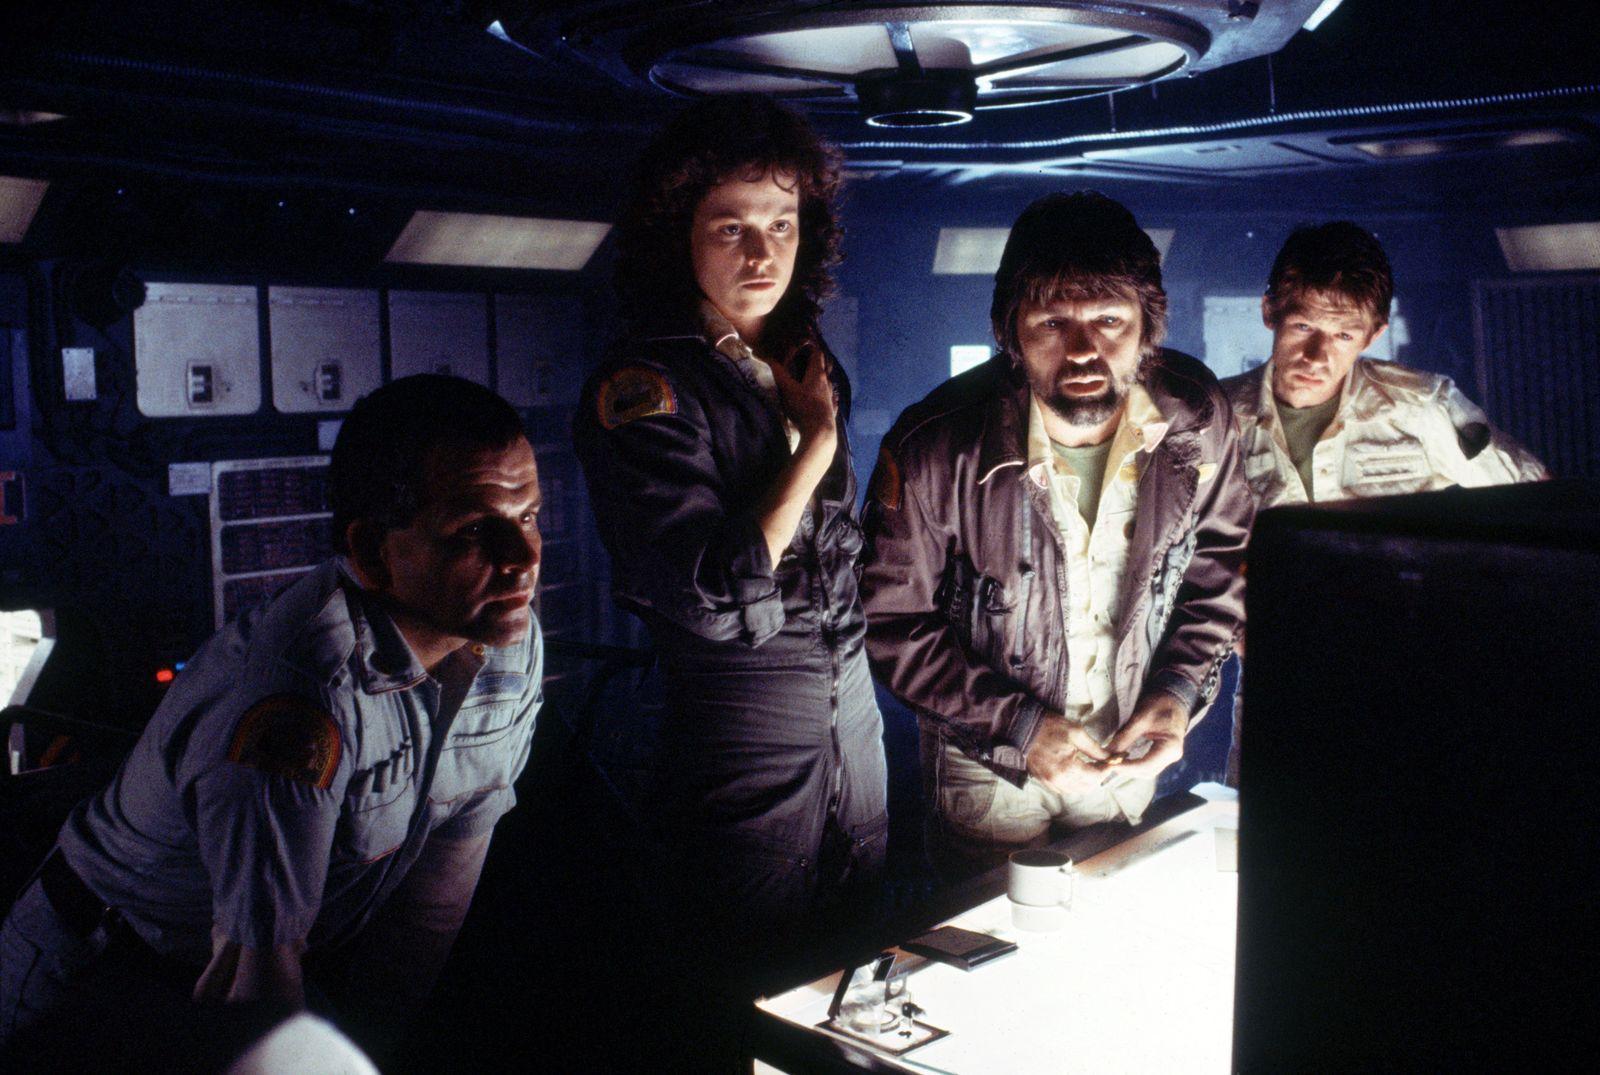 """Alien: The Director's Cut"" Ian Holm, Sigourney Weaver, Tom Skerritt, John Hurt © 1979, 2003 20th Century Fox Photo by Robert Penn"